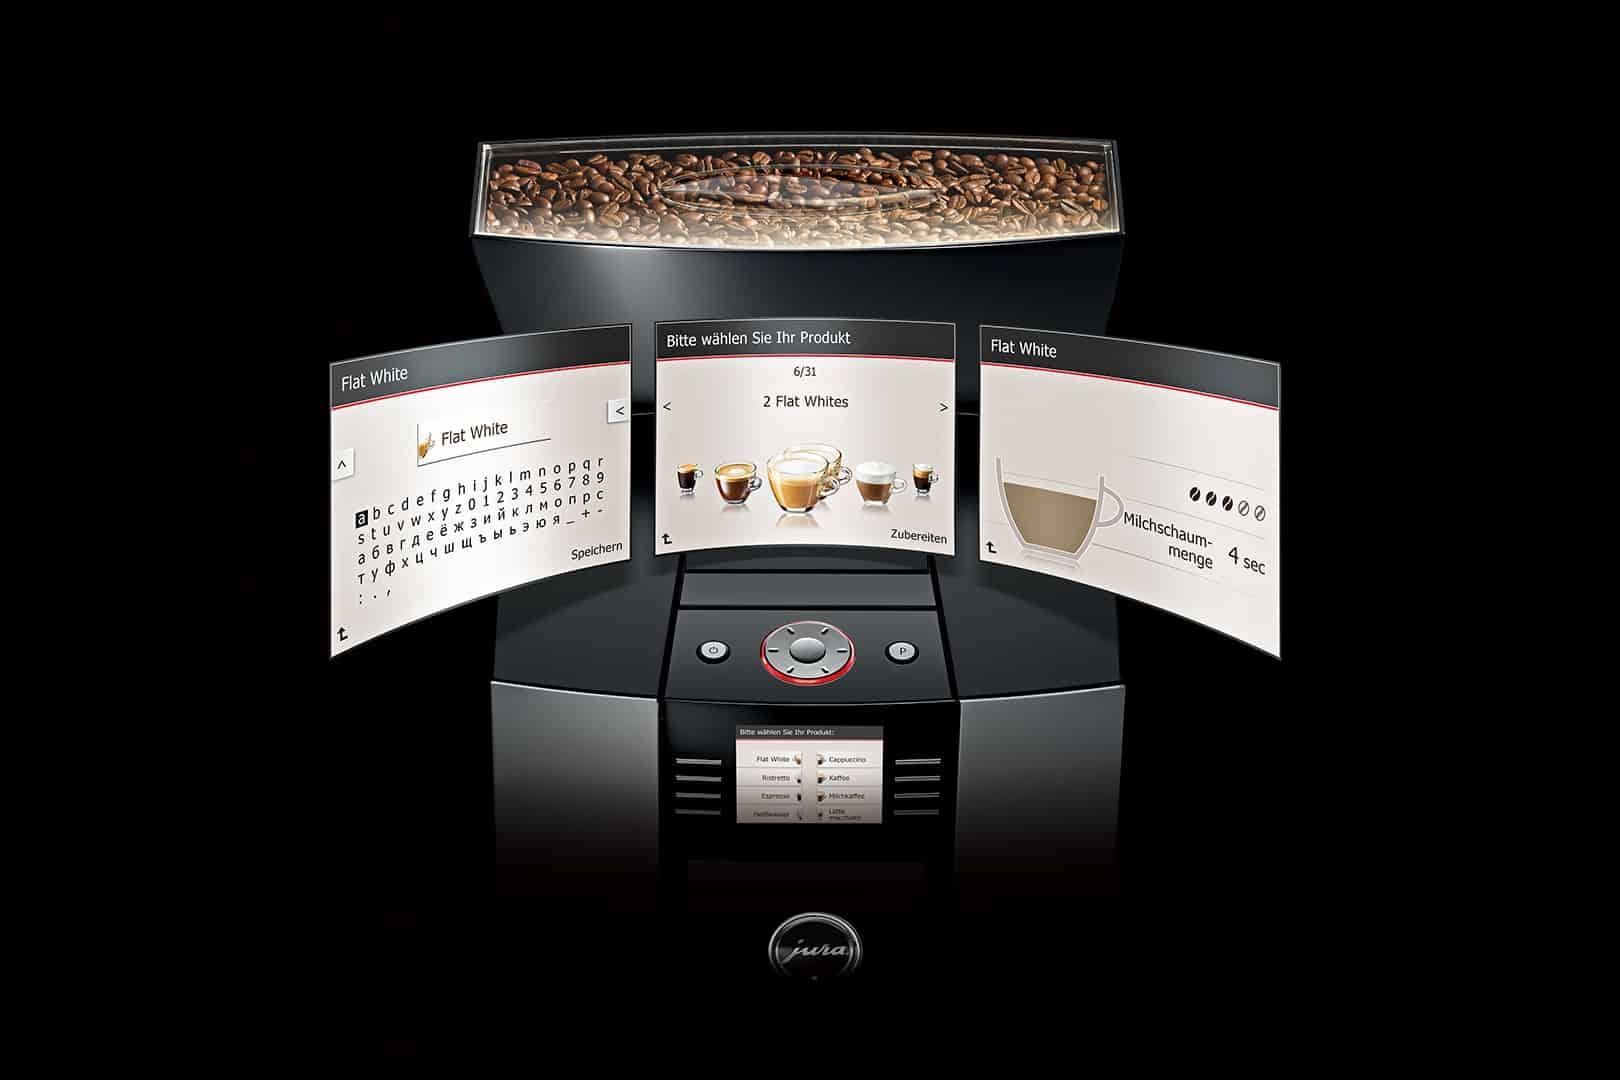 Diferencia entre máquina de café vending y máquina de café OCS